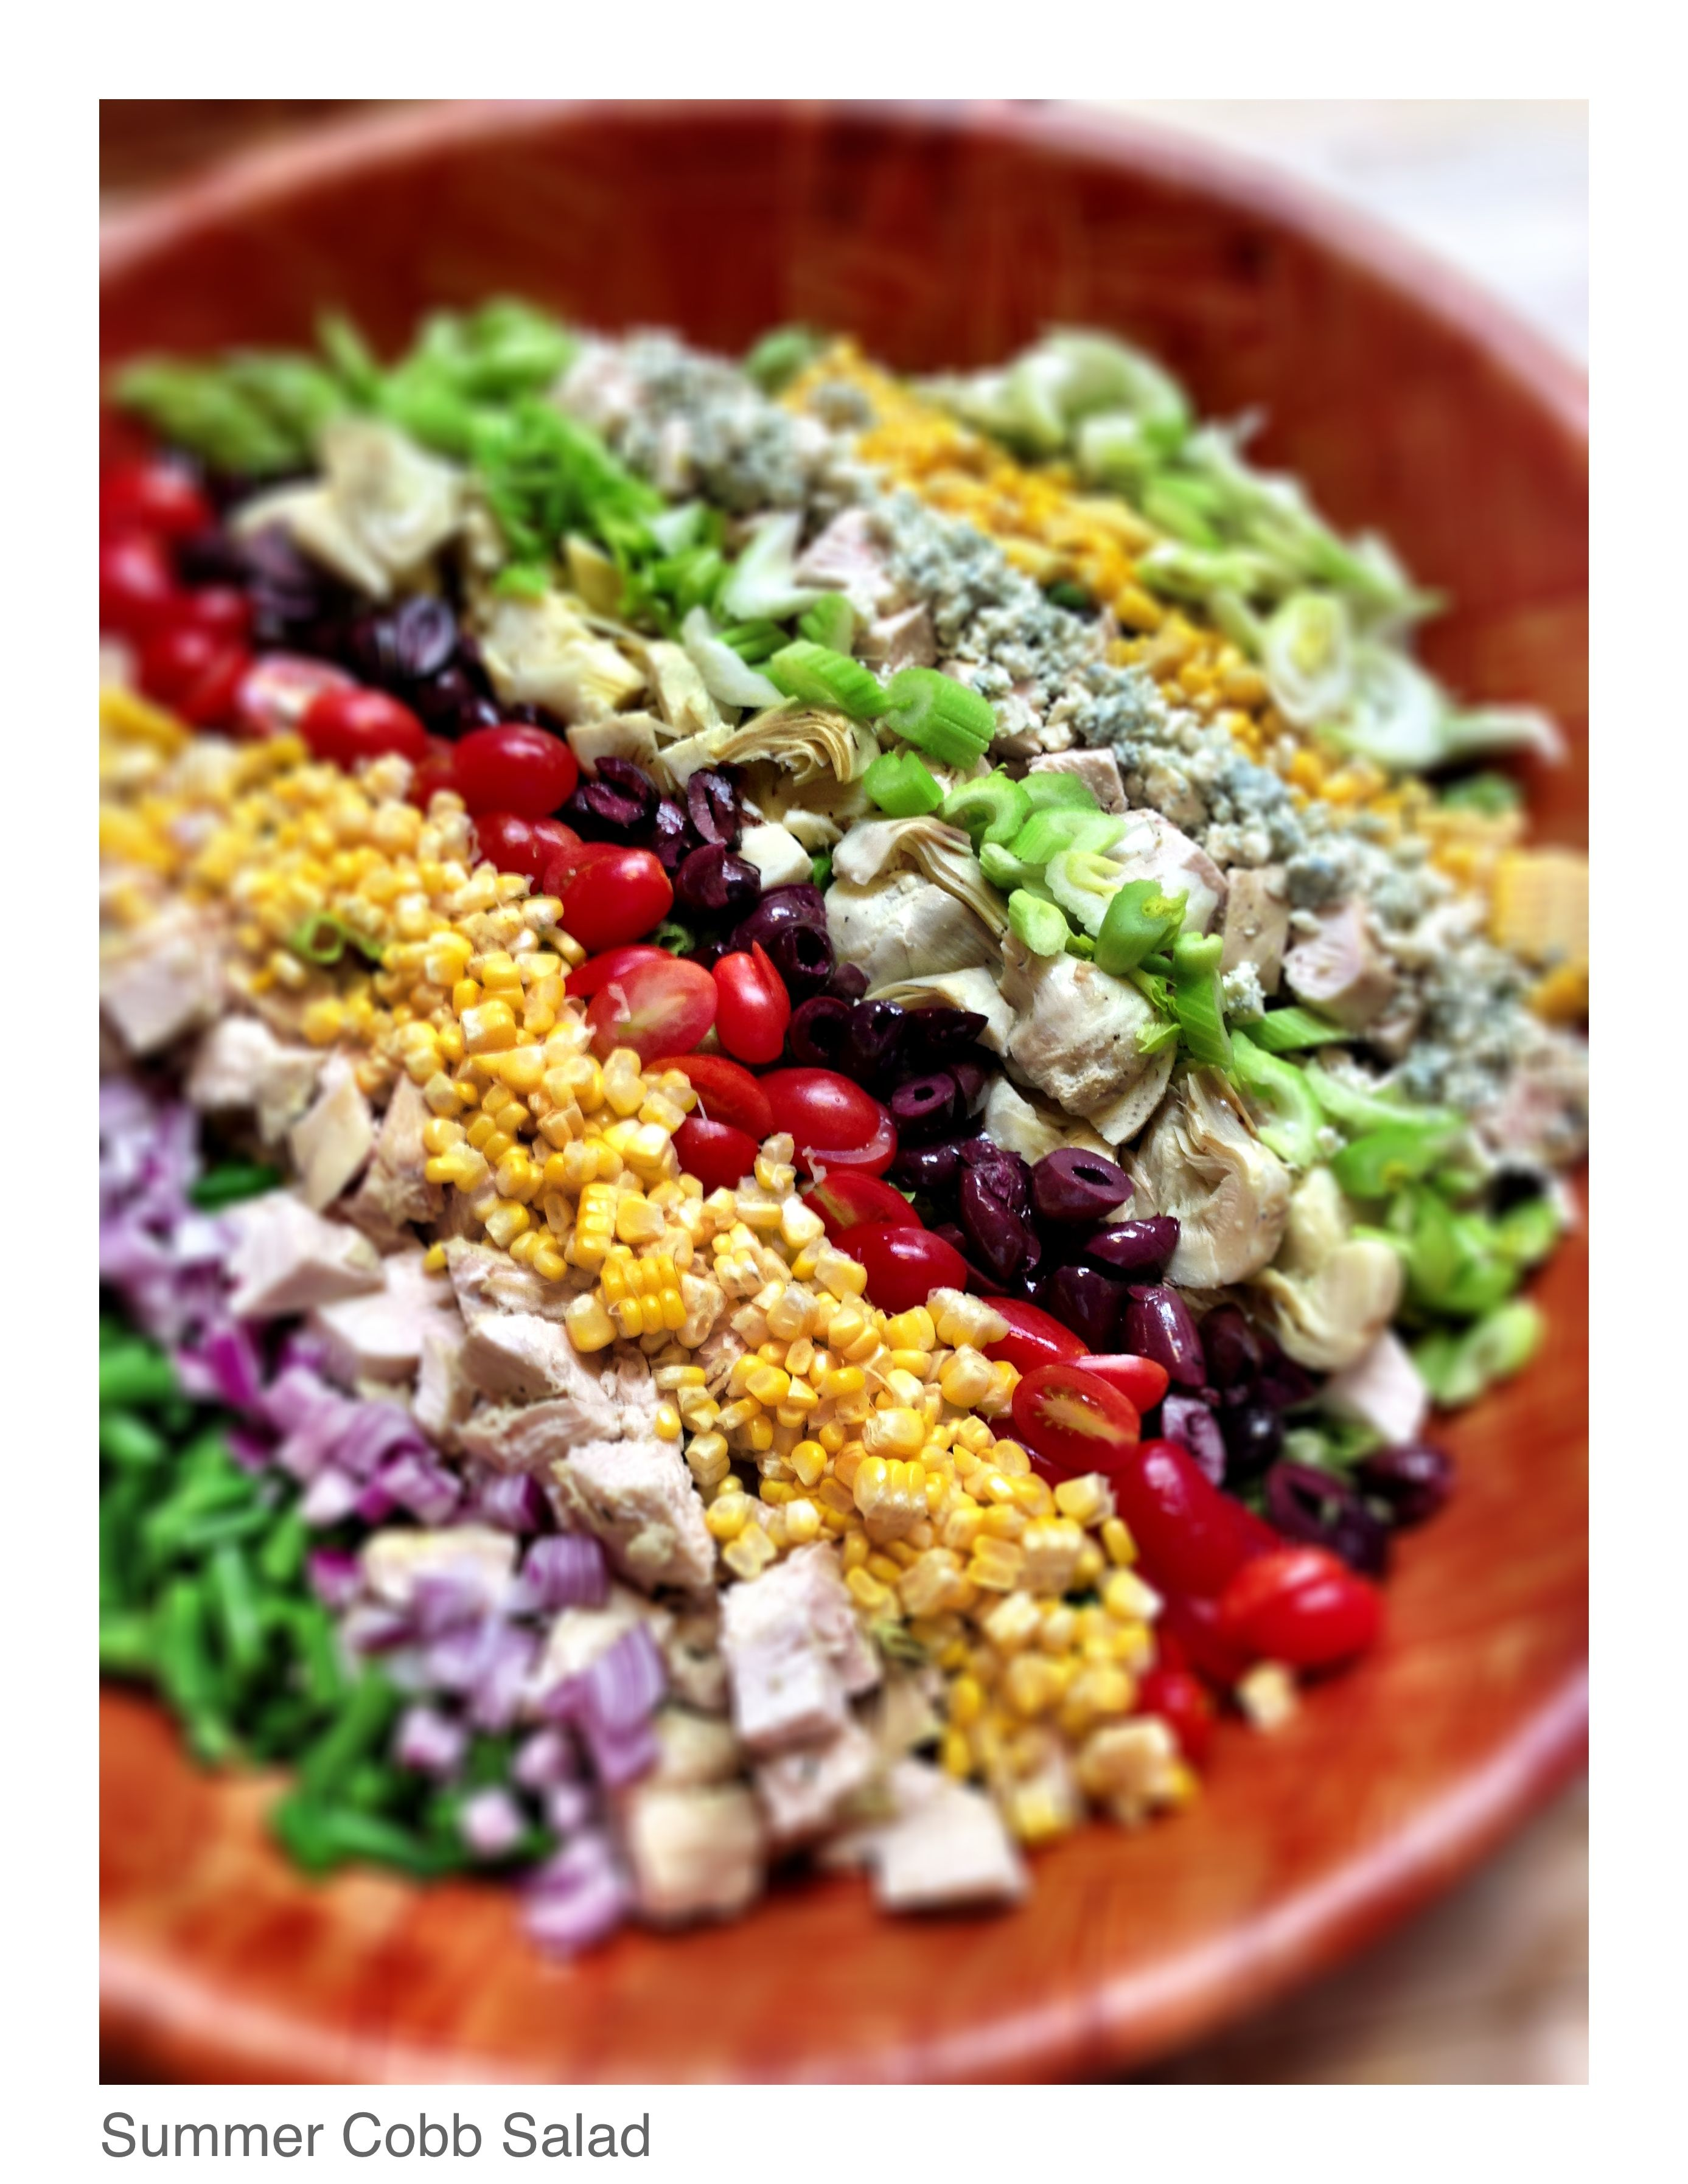 Cobb salad | Just Amazing Salads | Pinterest